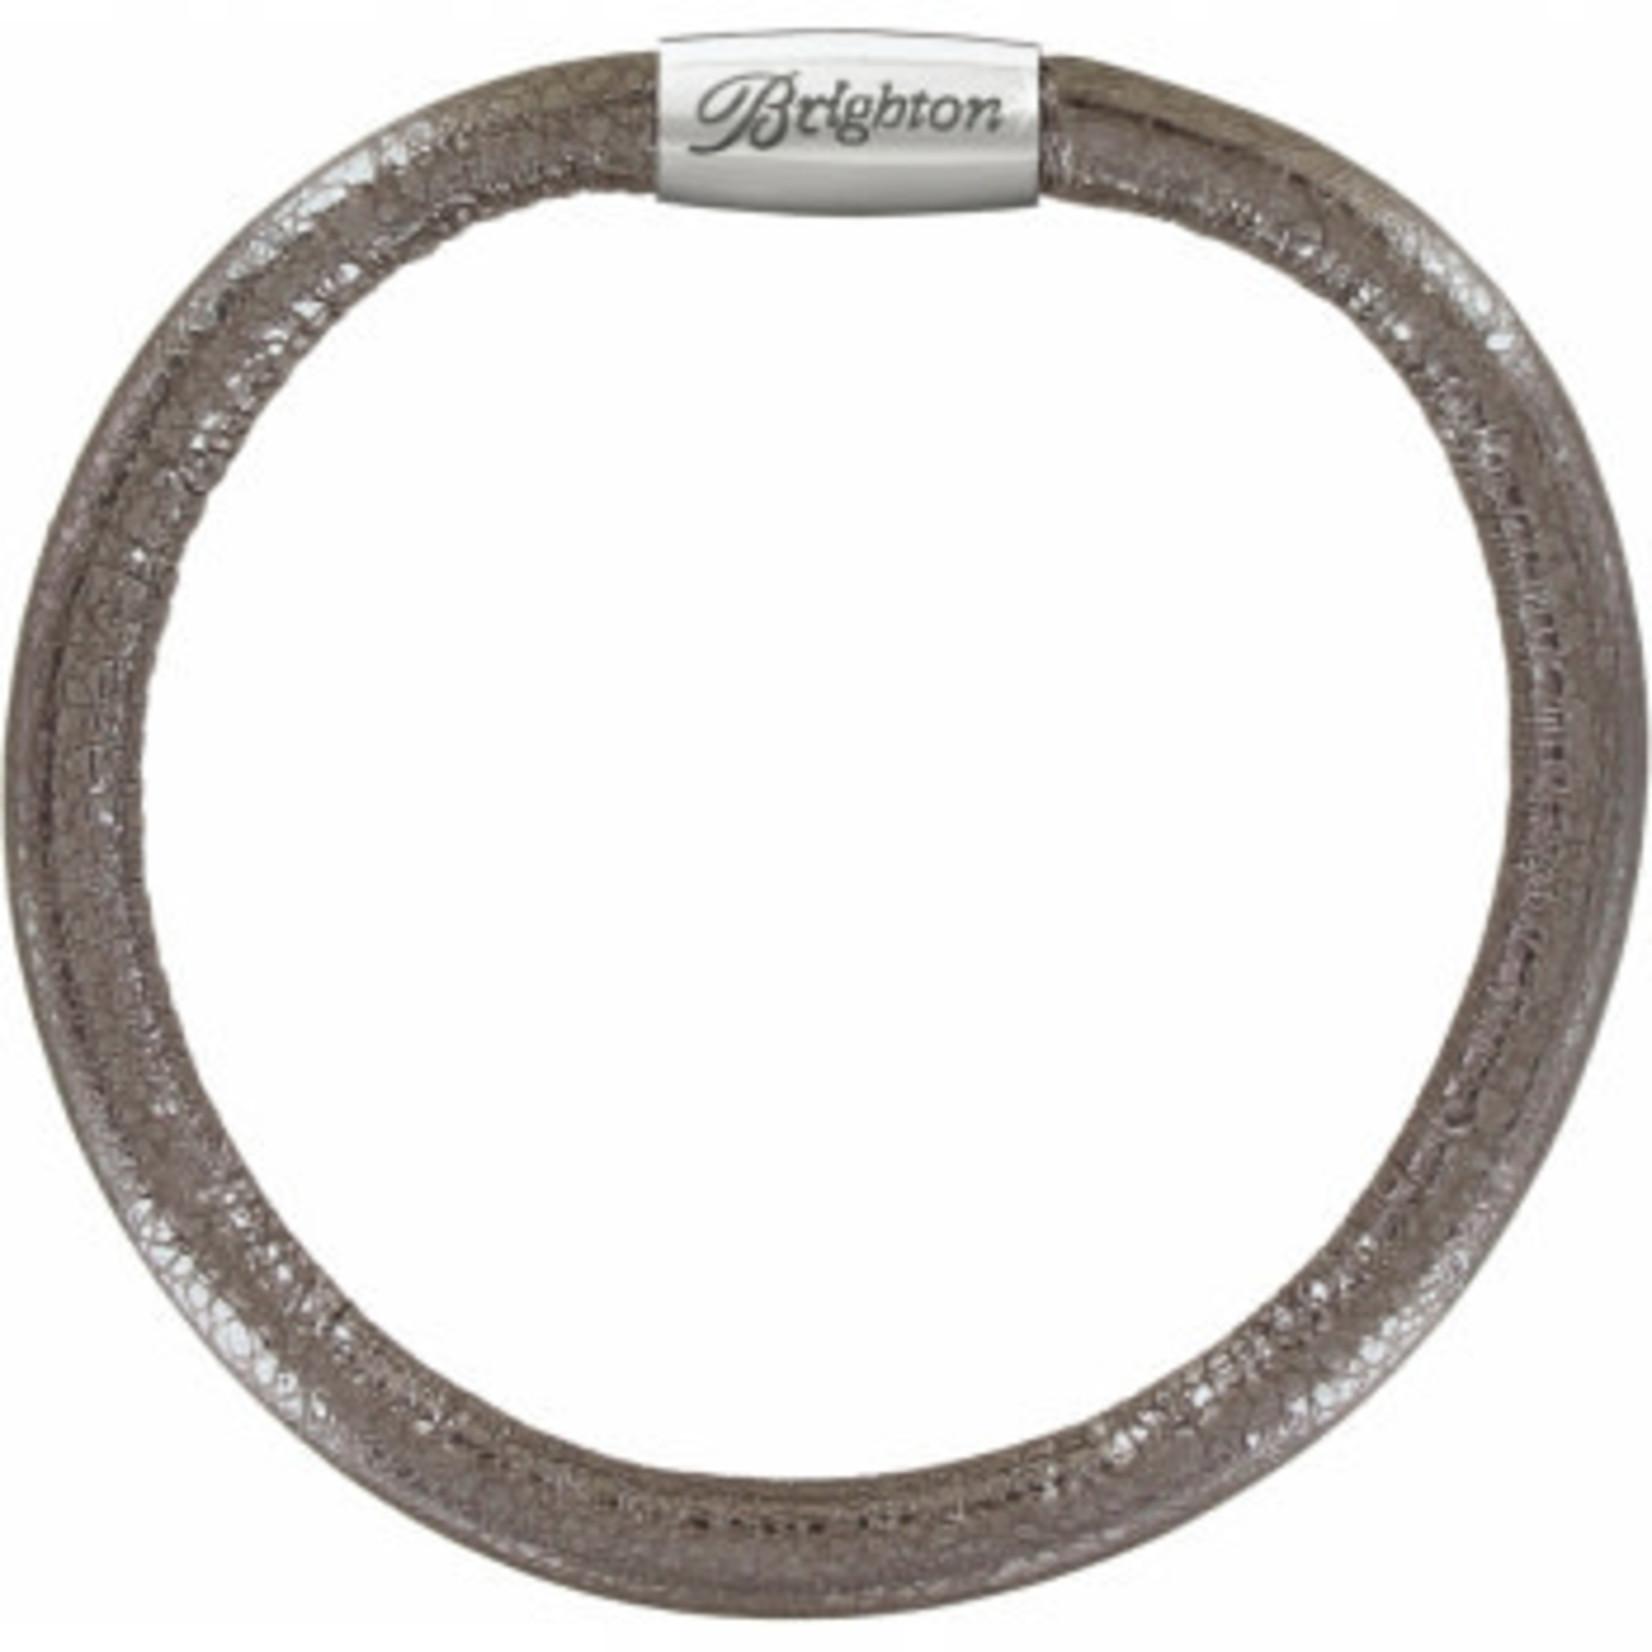 Brighton 60495 Bracelet/Woodstock/Single